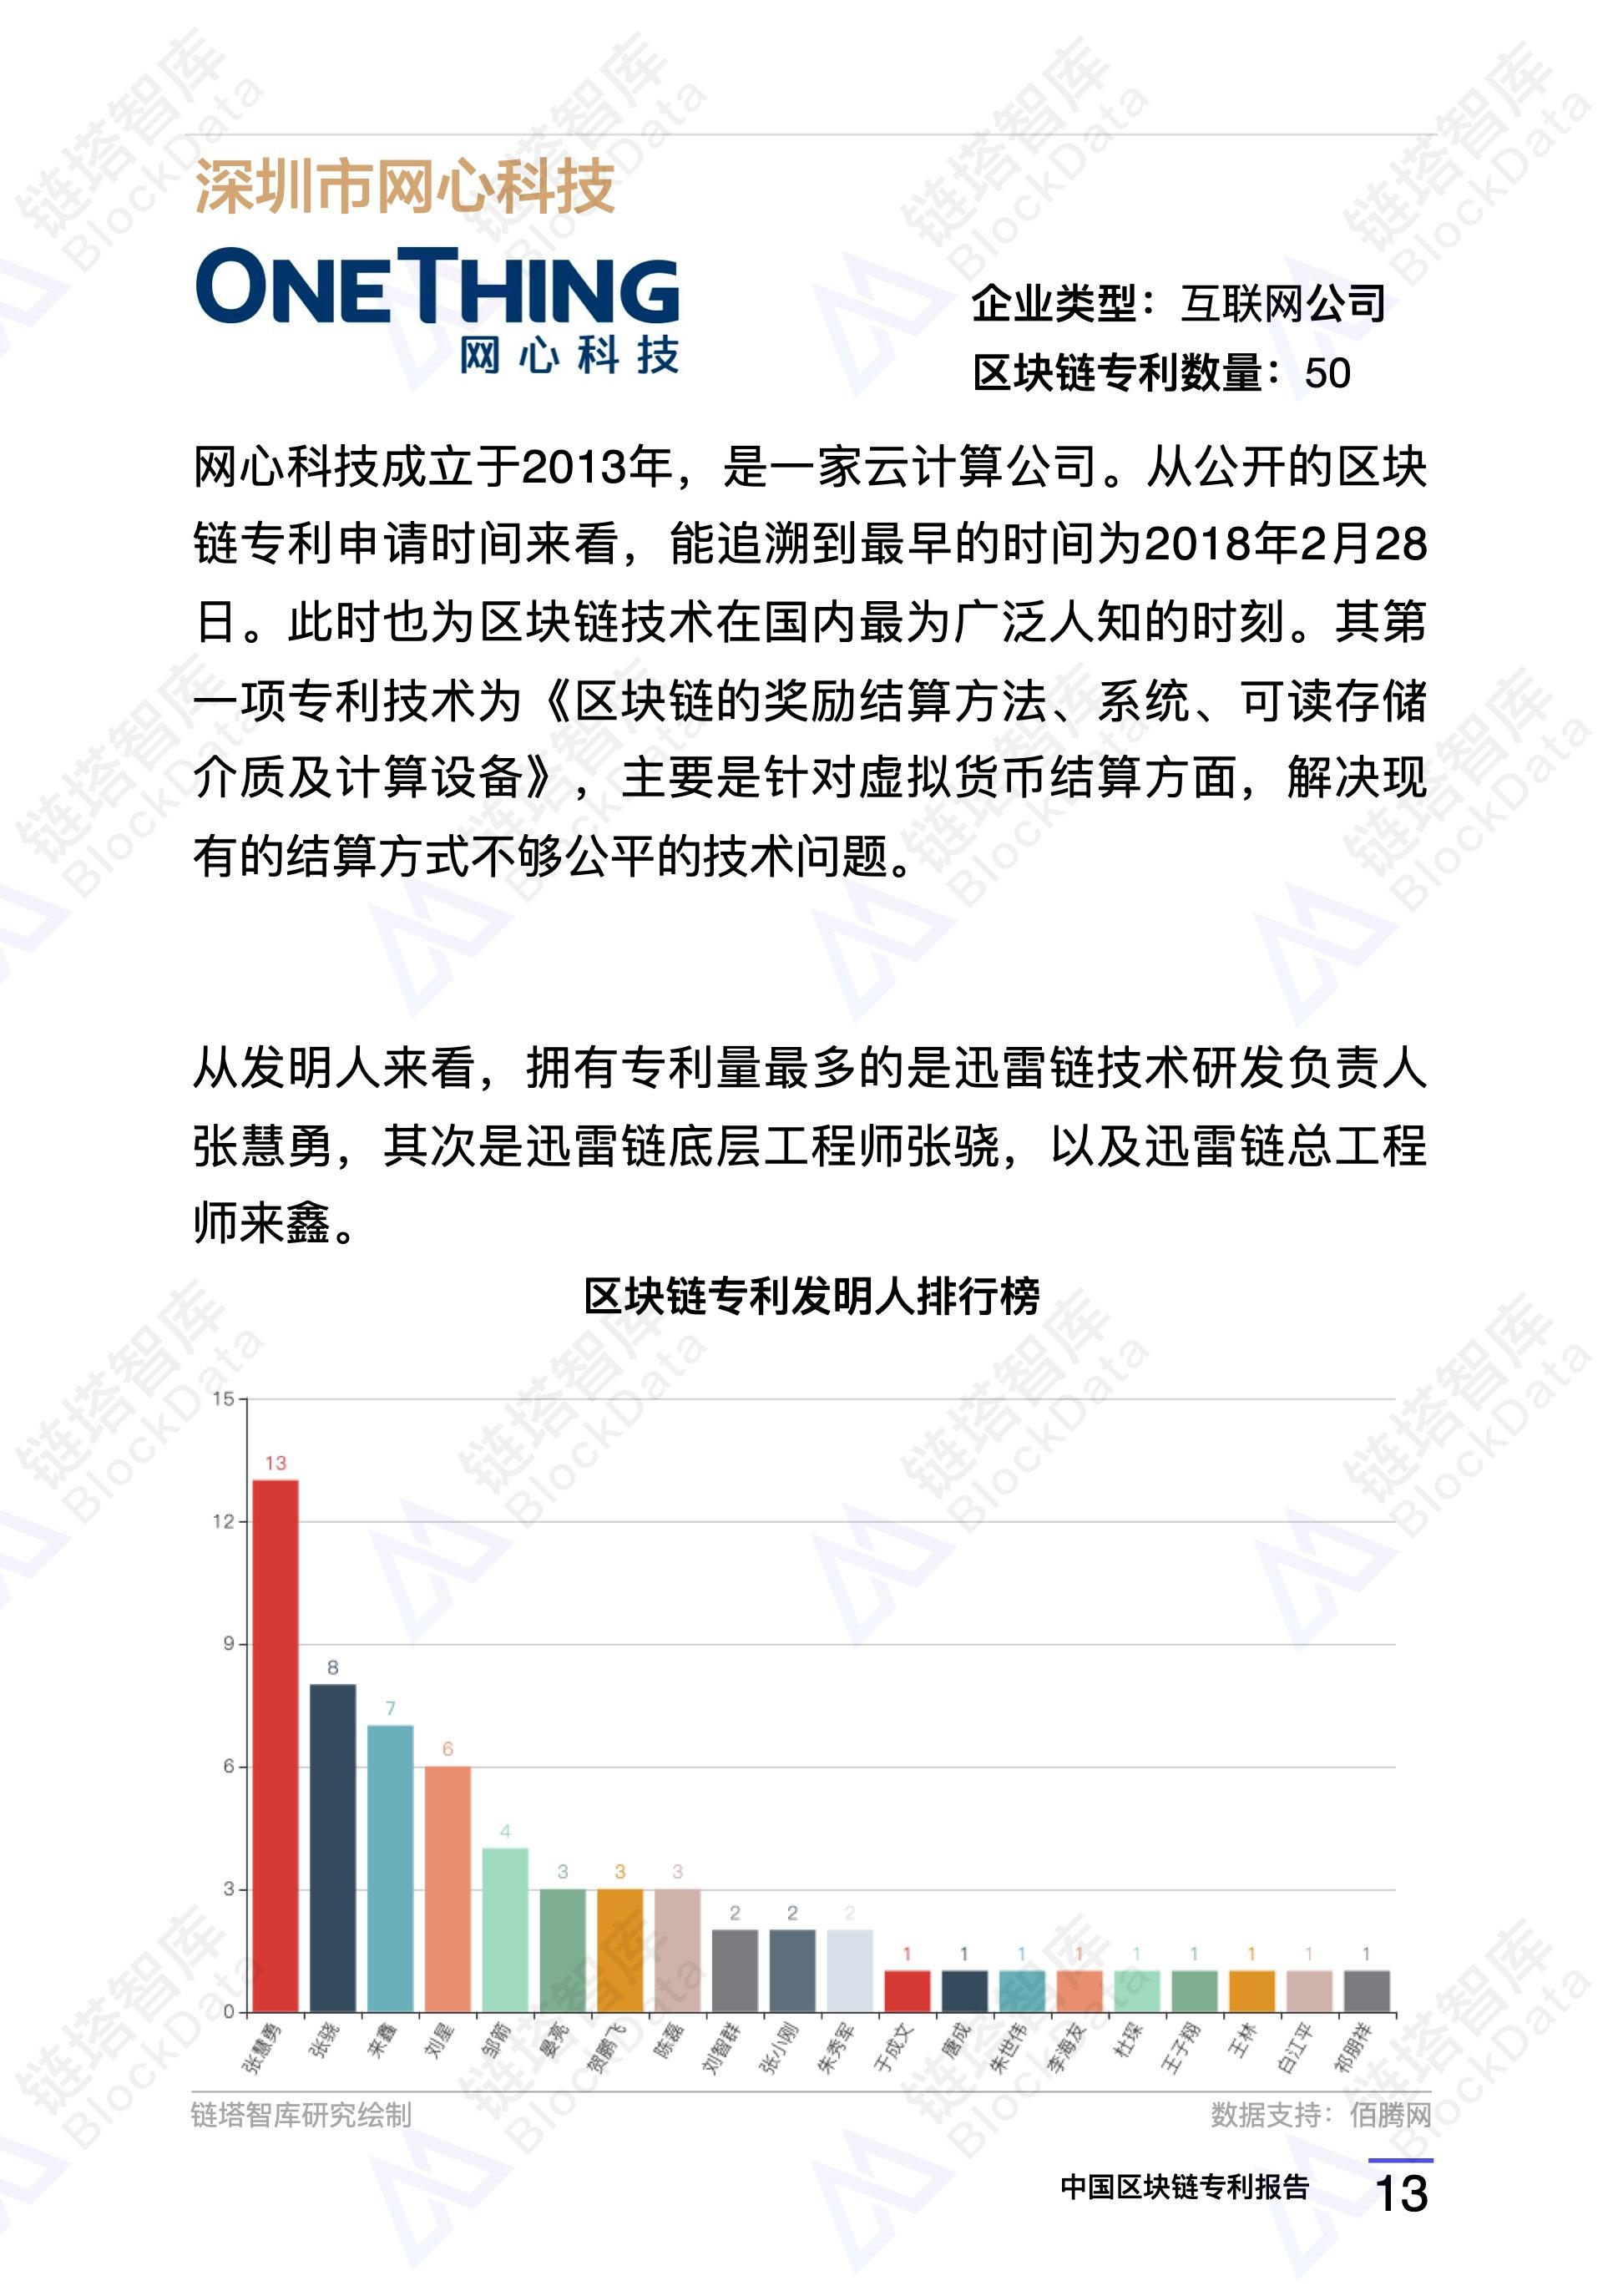 2019 Q1区块链专利报告:阿里稳居第一,平安科技、网心科技强势上榜